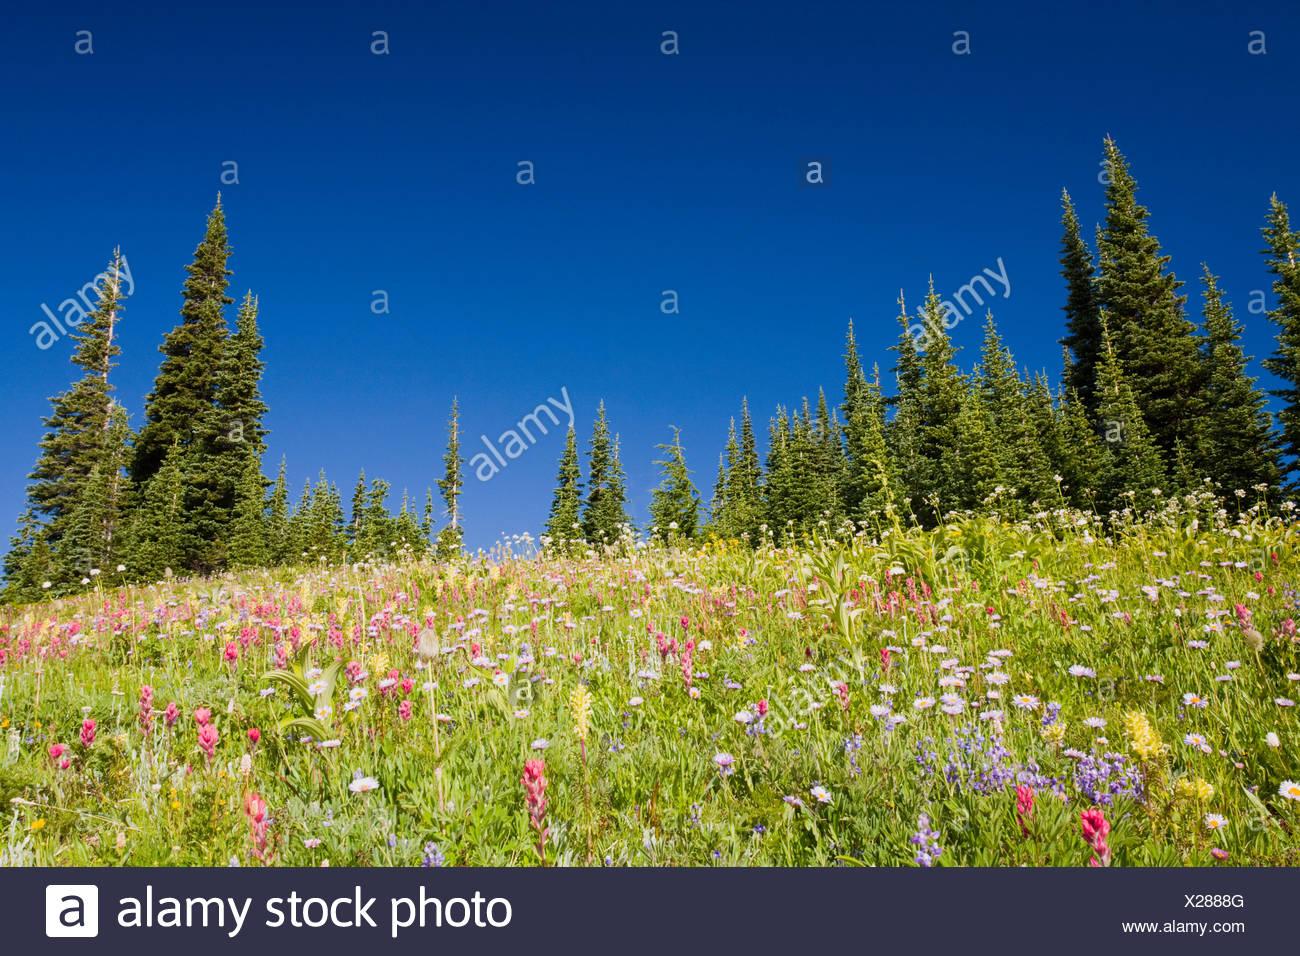 Mount rainier national park - Stock Image